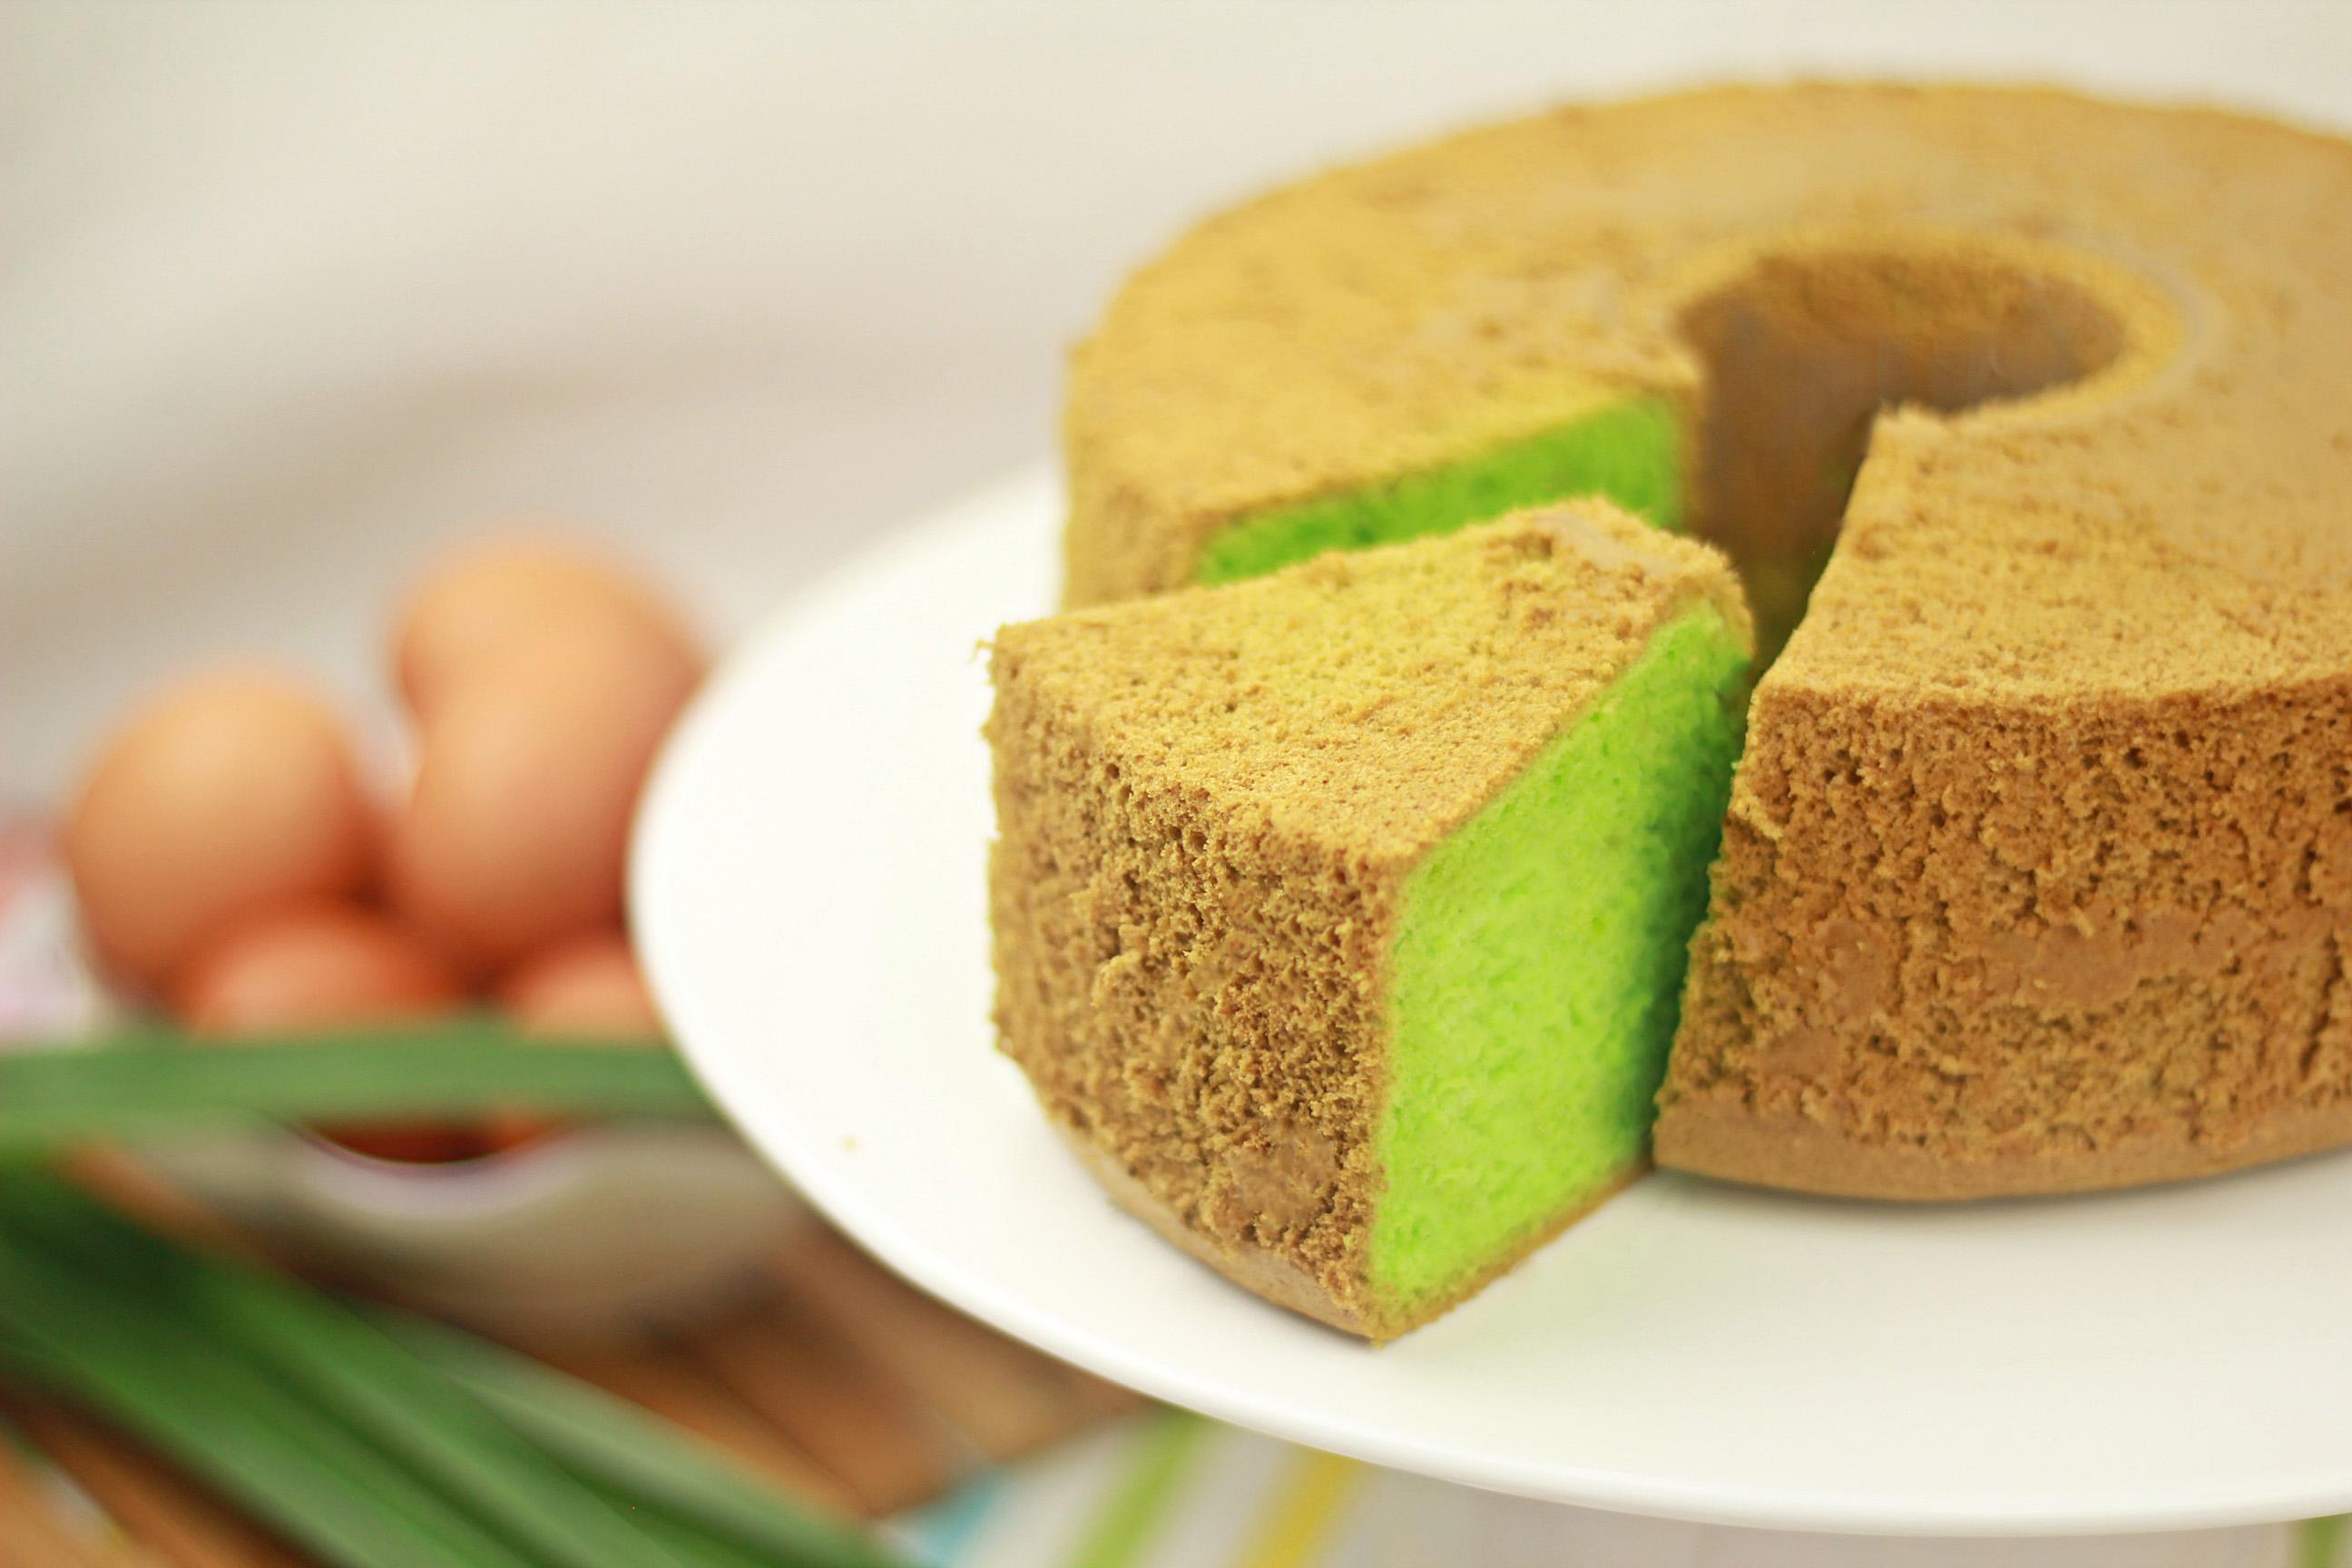 Kue Pandan yang juga populer di Indonesia (Foto: youtube.com/zatayayummyzonghan)